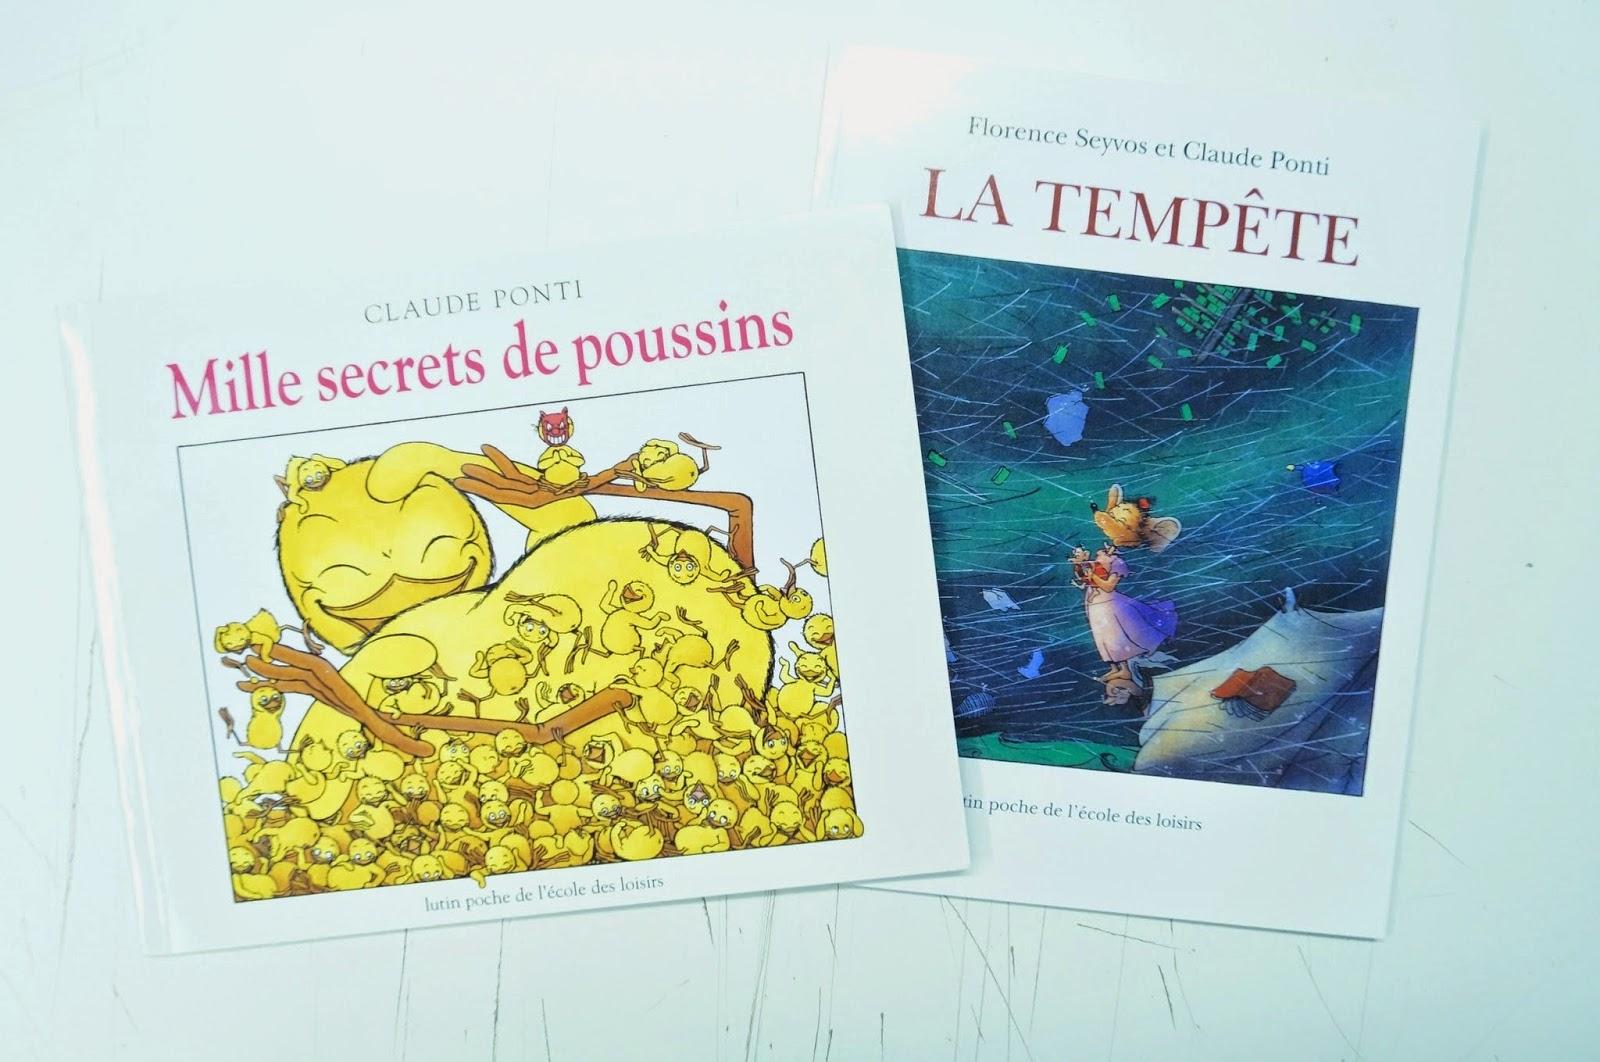 La Librairie Madrid: Le Grand Claude Ponti À La Librairie avec La Tempête Claude Ponti